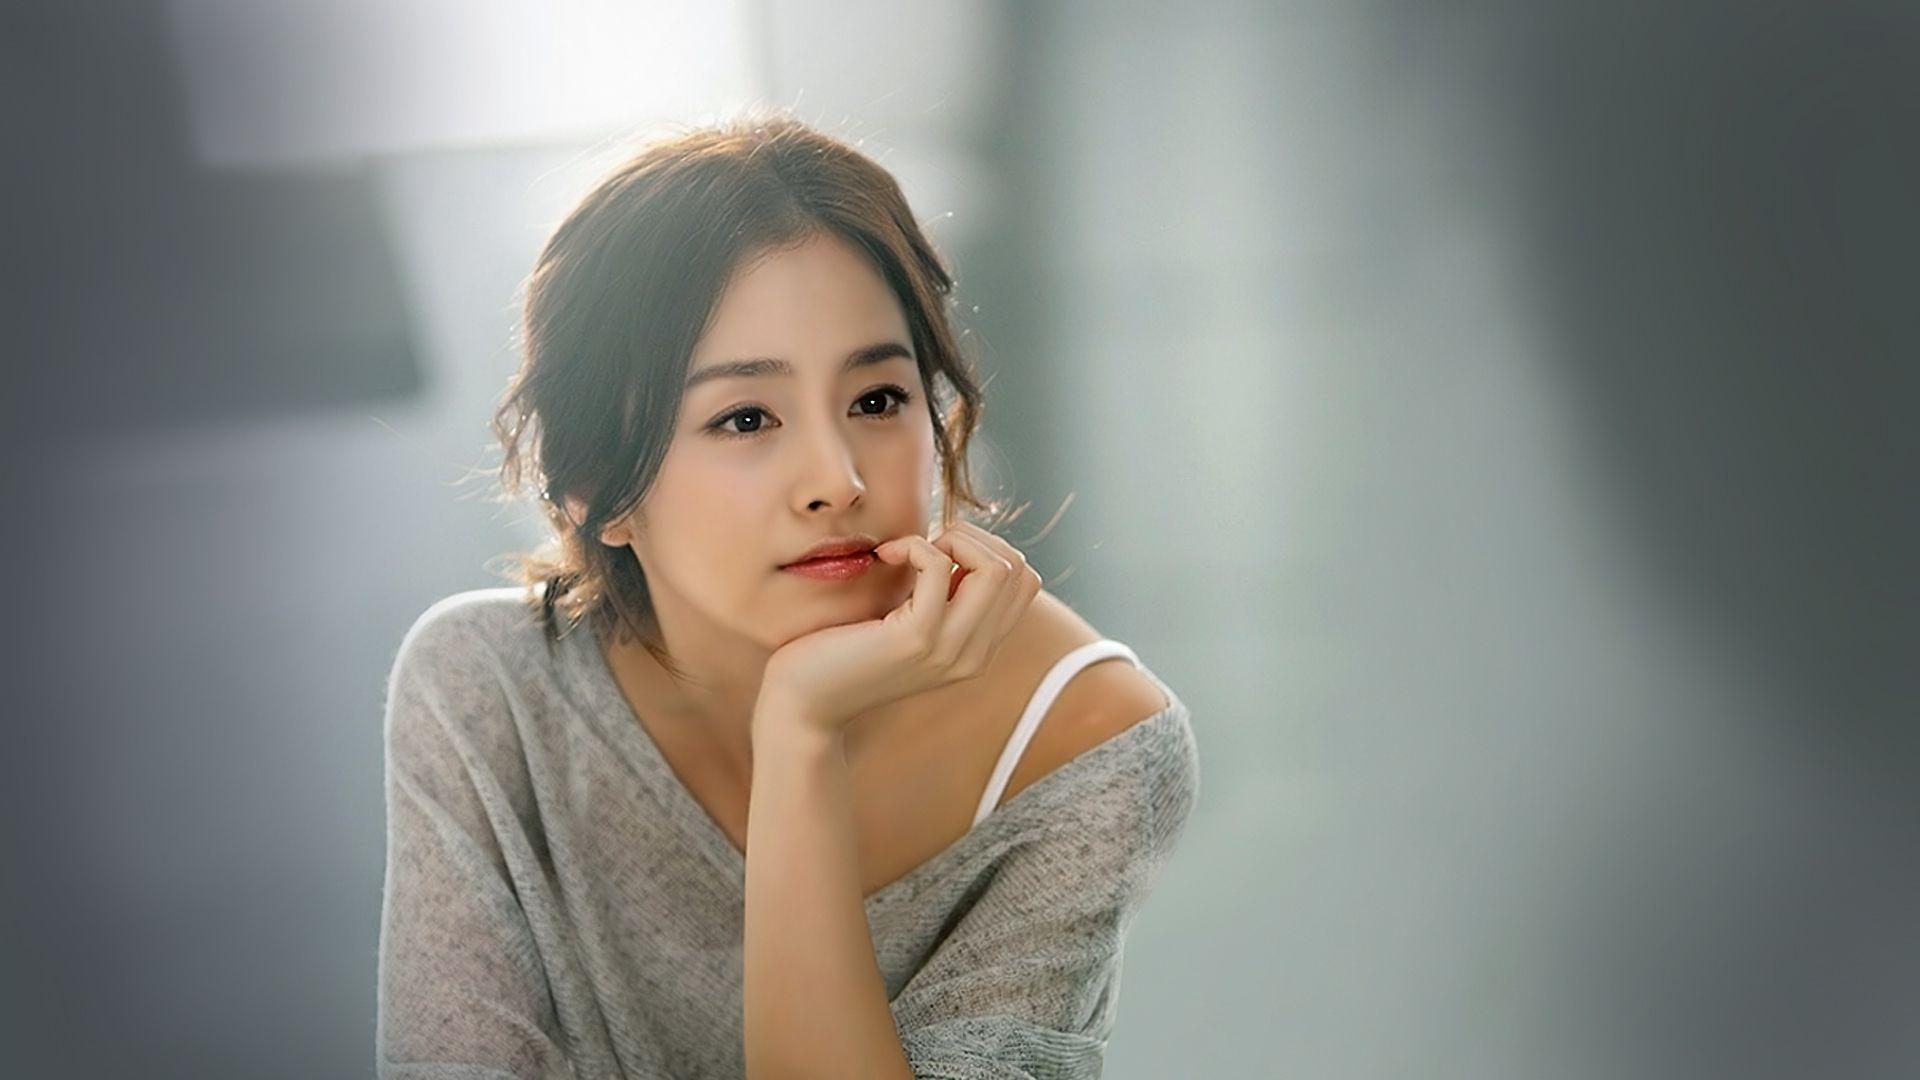 Korean Actress Wallpapers Wallpaper Cave